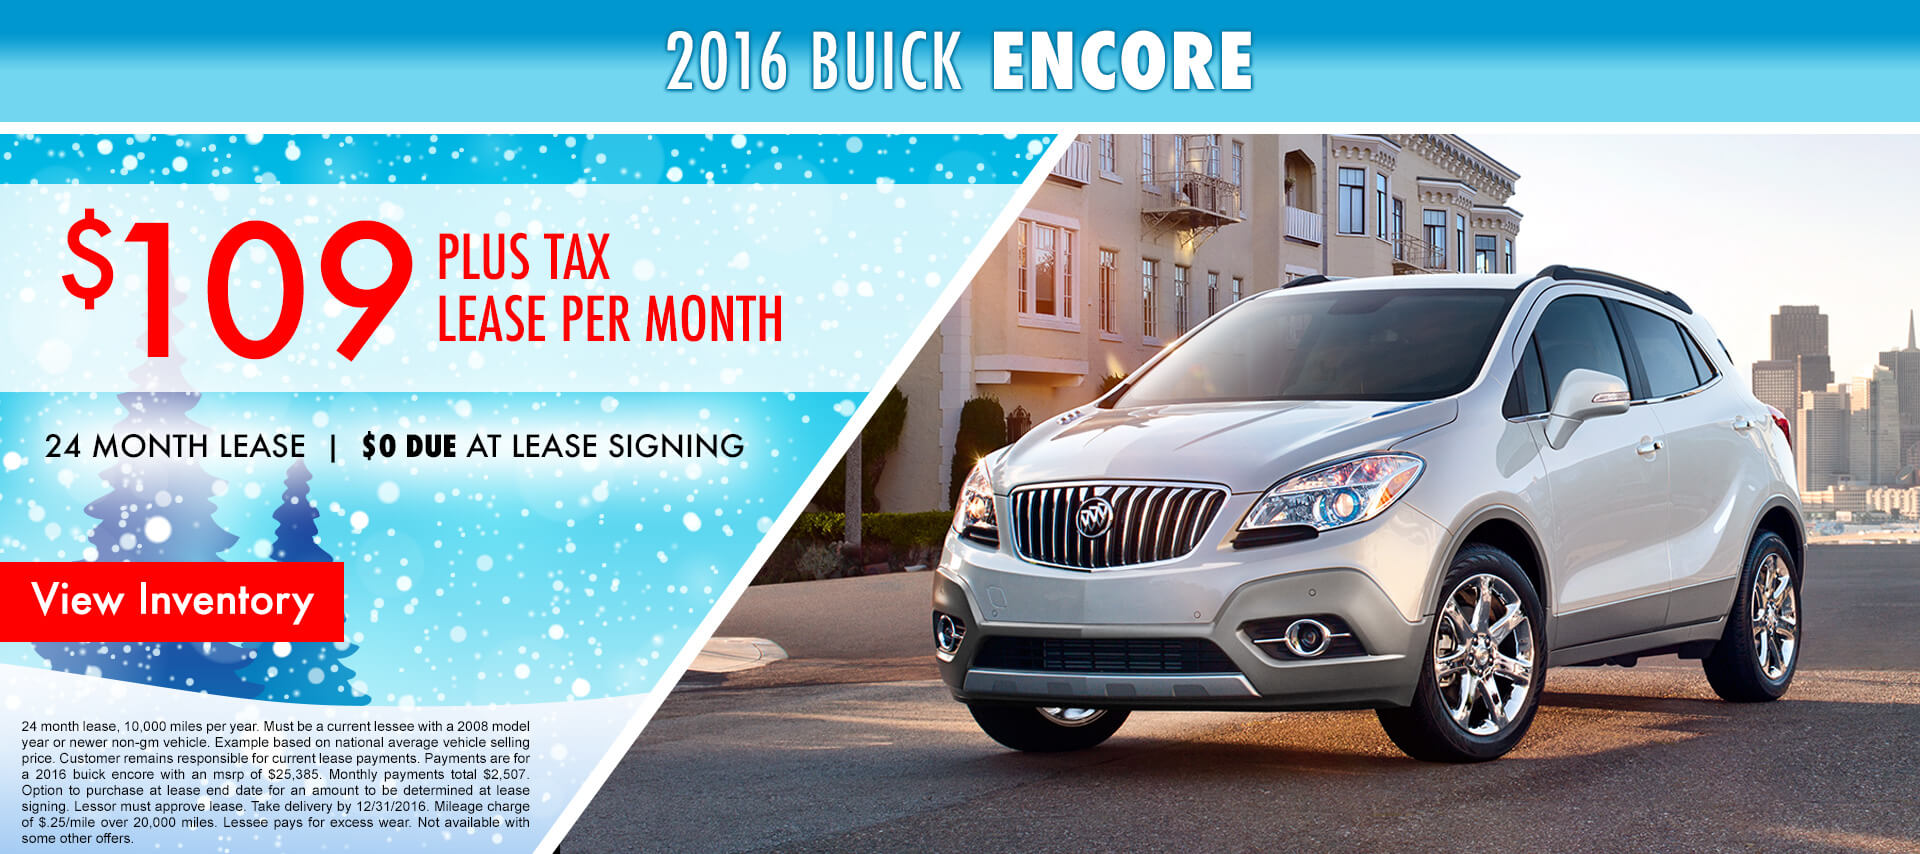 Buick Encore HP